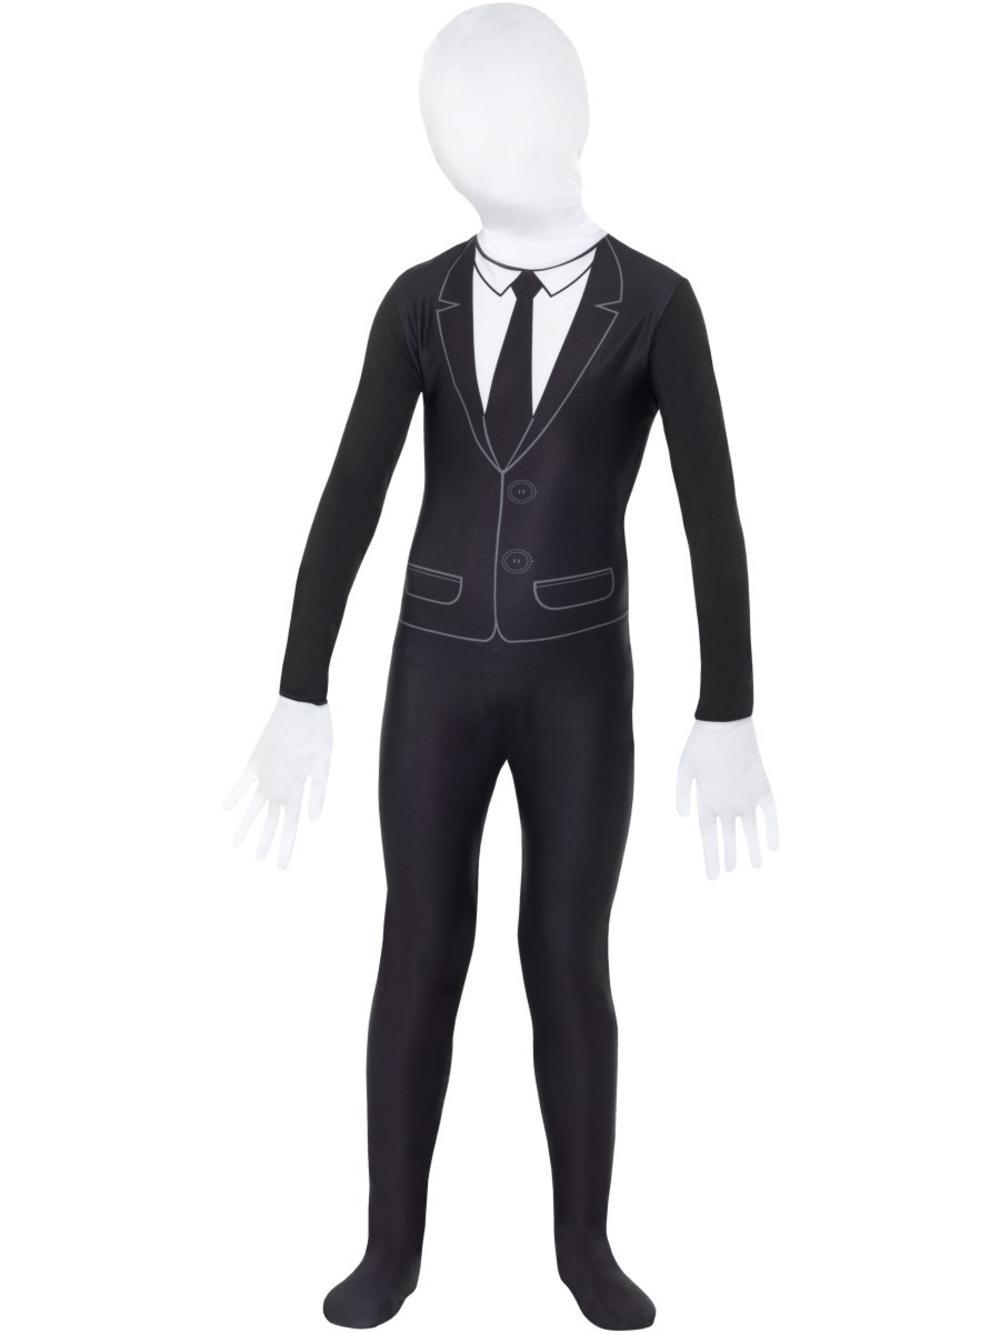 Supernatural Slenderman Boy Costume